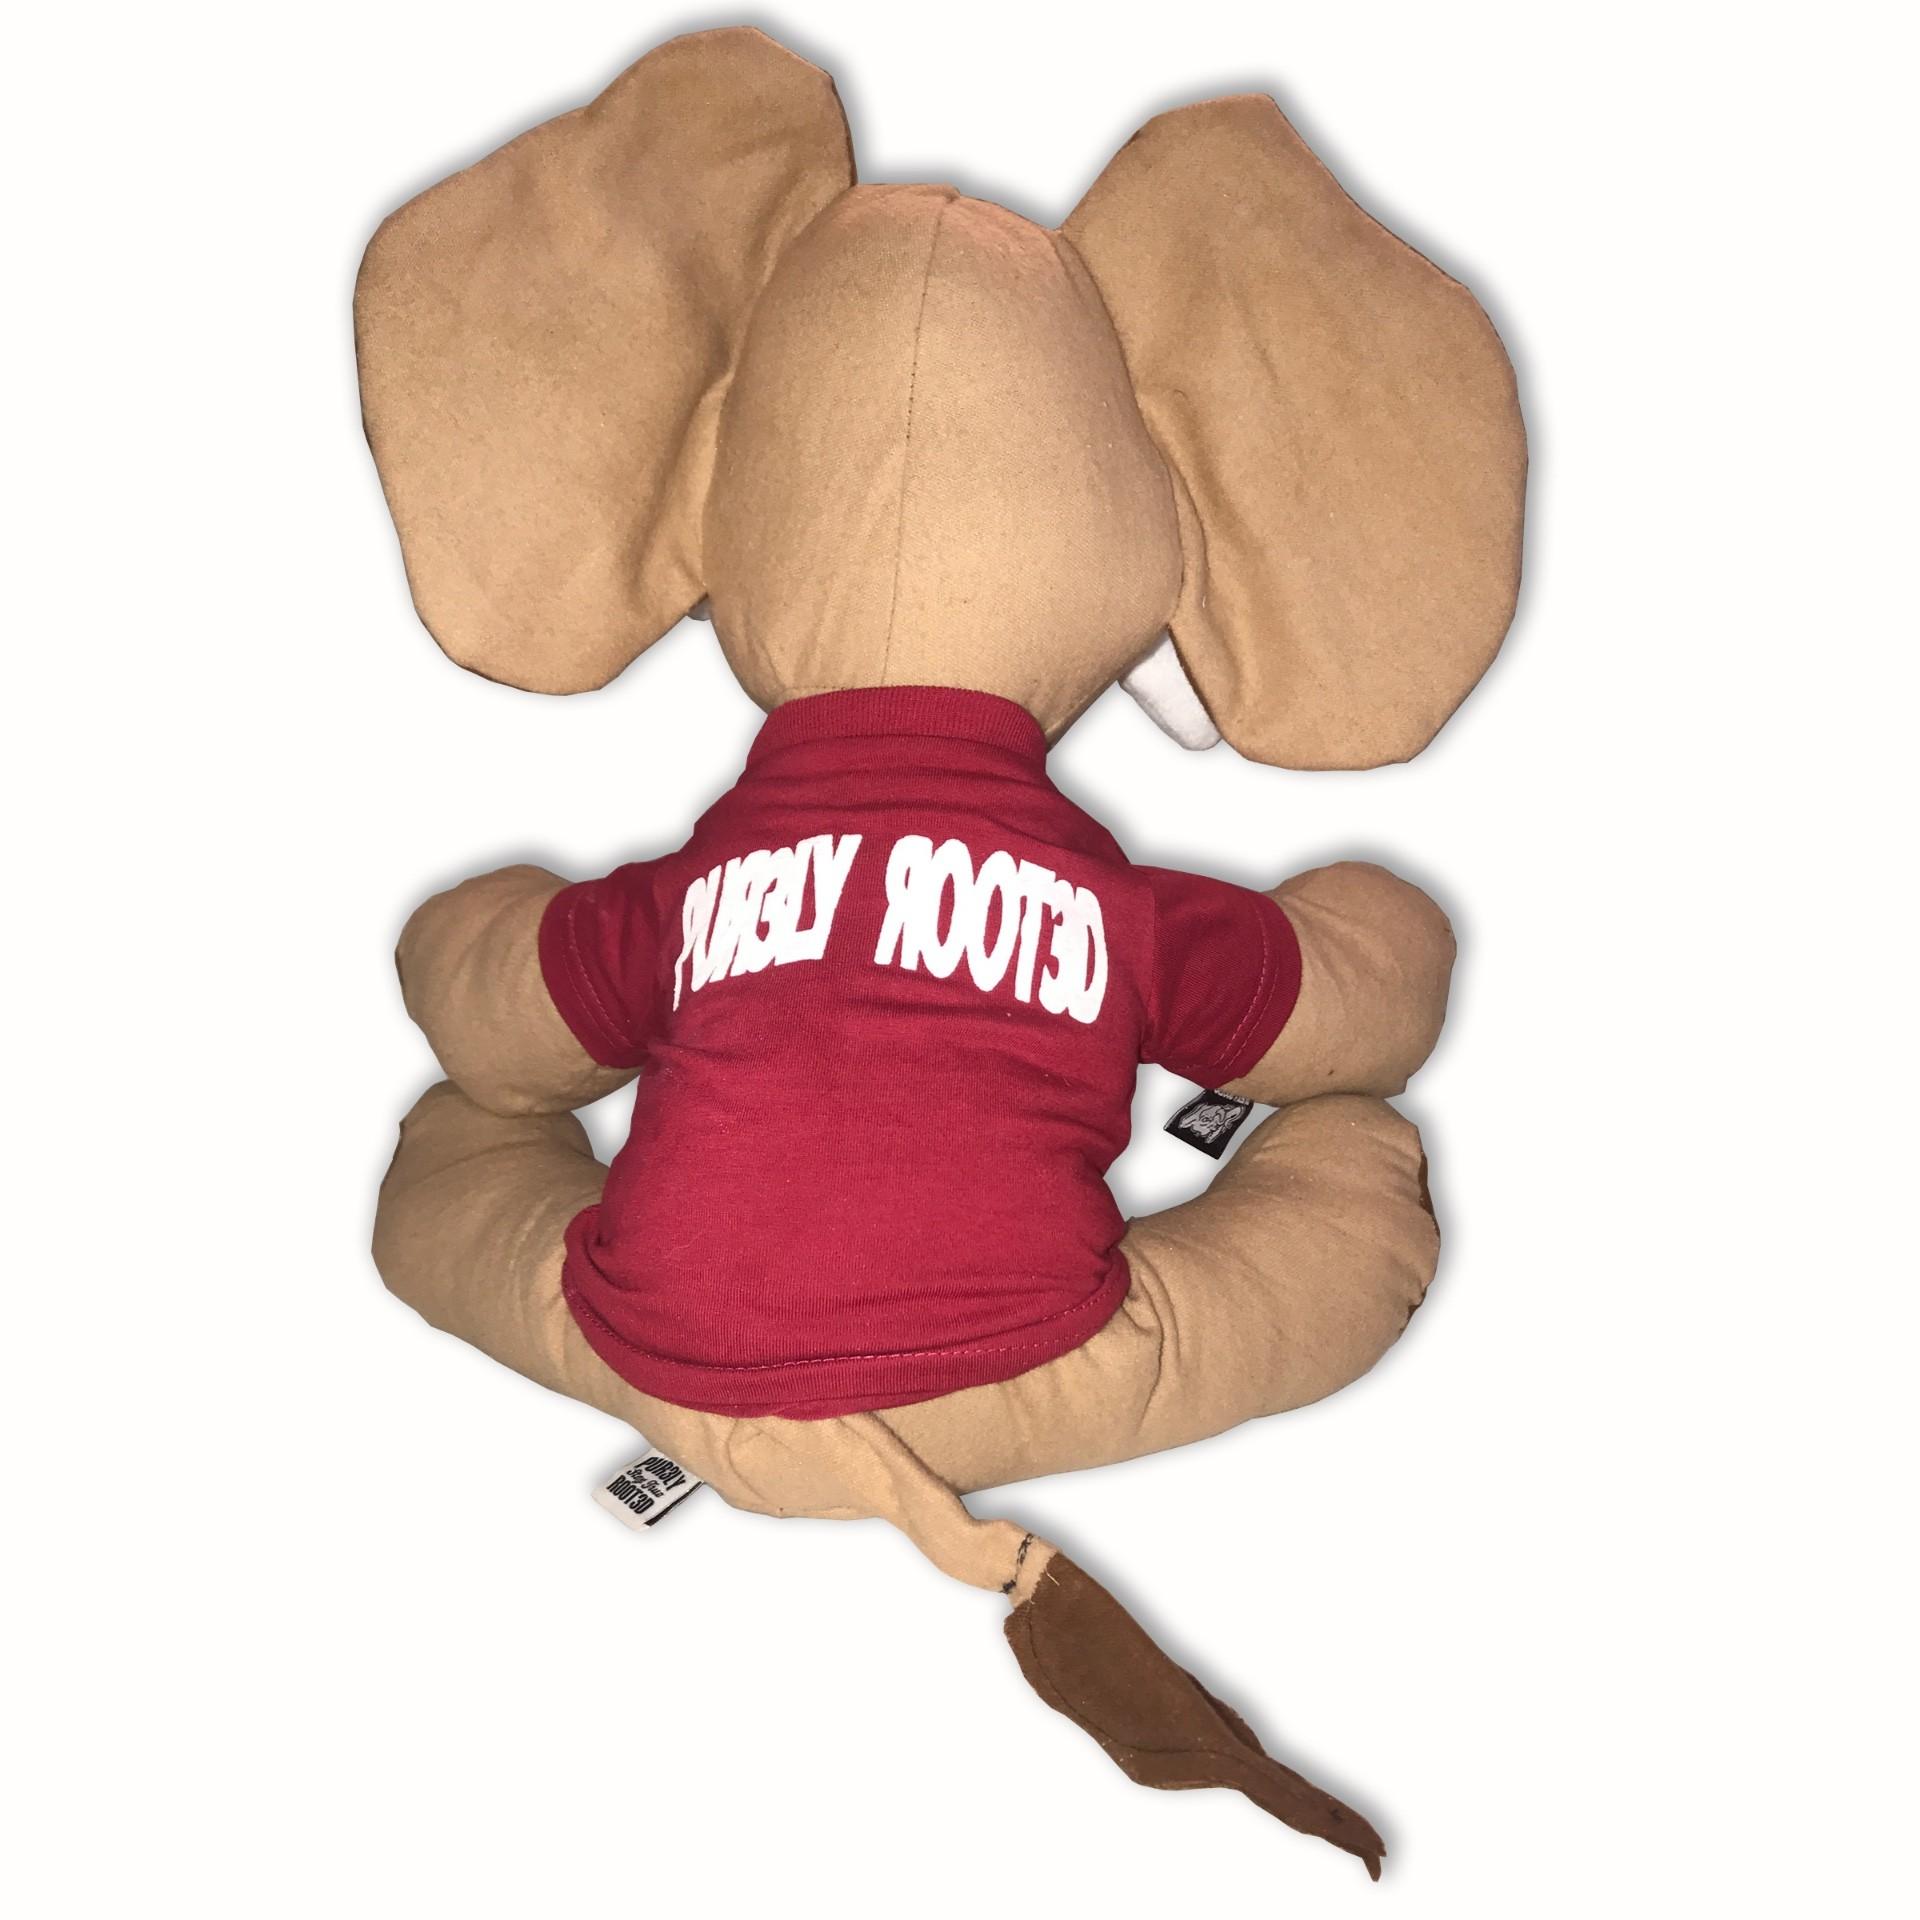 Tusk Mascot Stuffed Elephant Back1